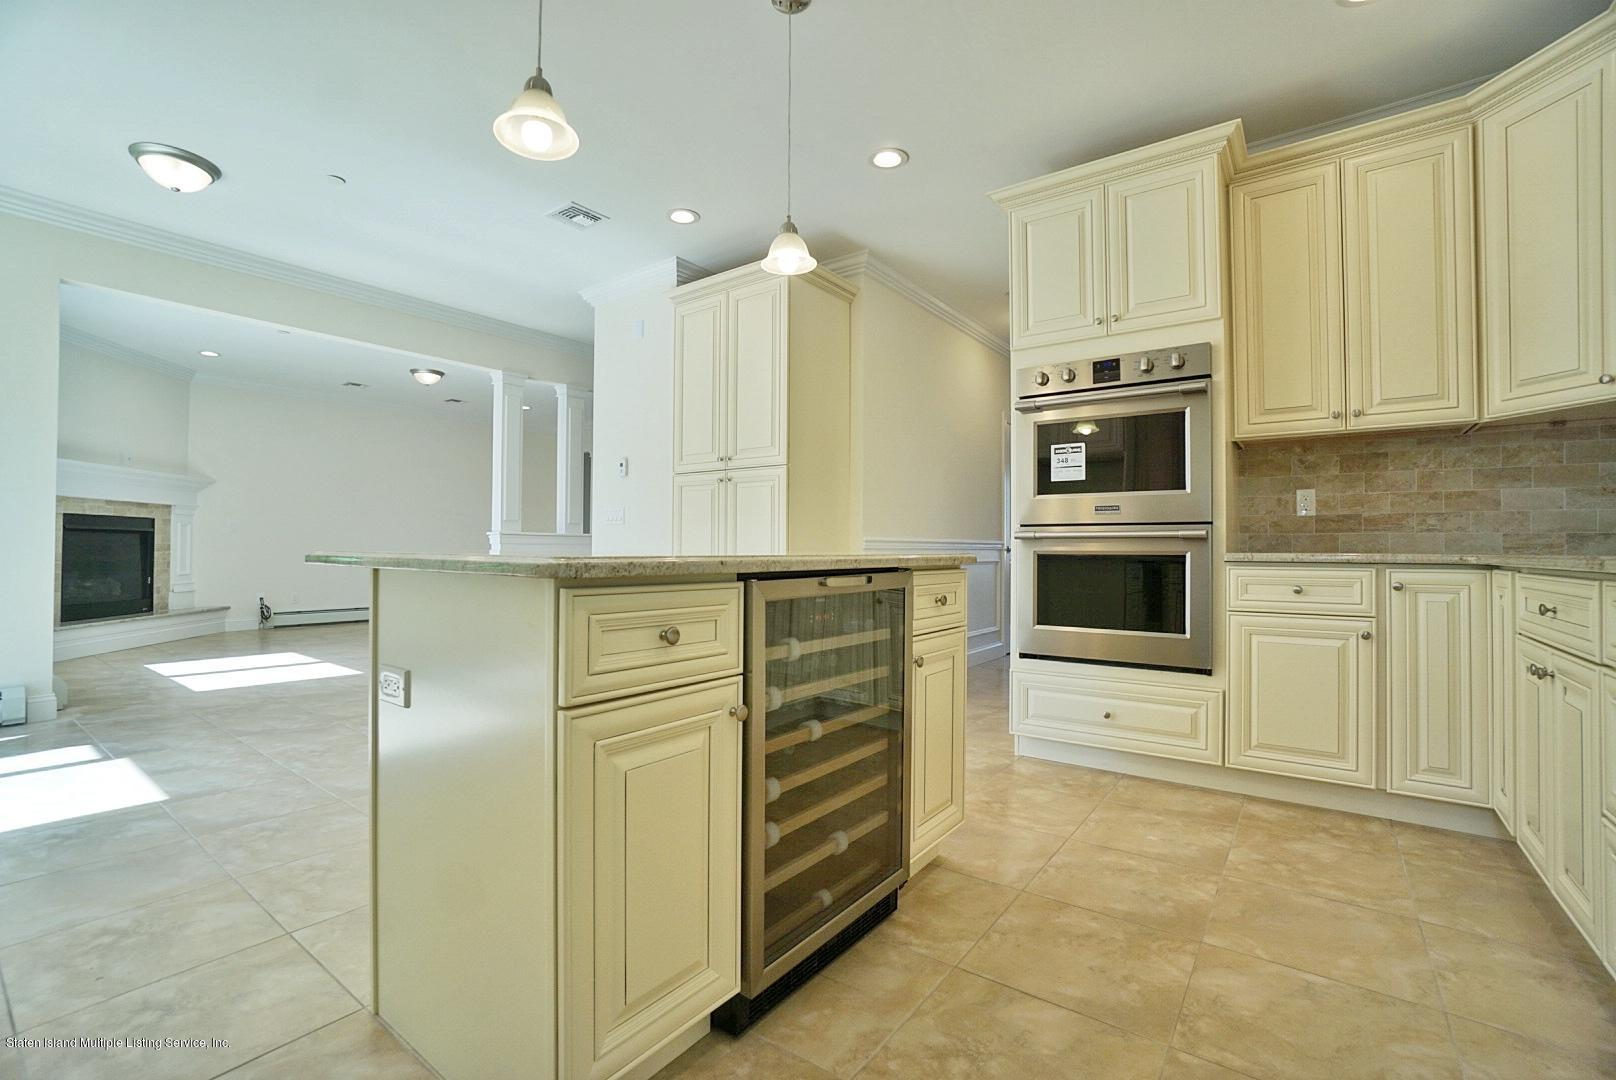 Single Family - Detached 678 Yetman Avenue  Staten Island, NY 10307, MLS-1132766-18